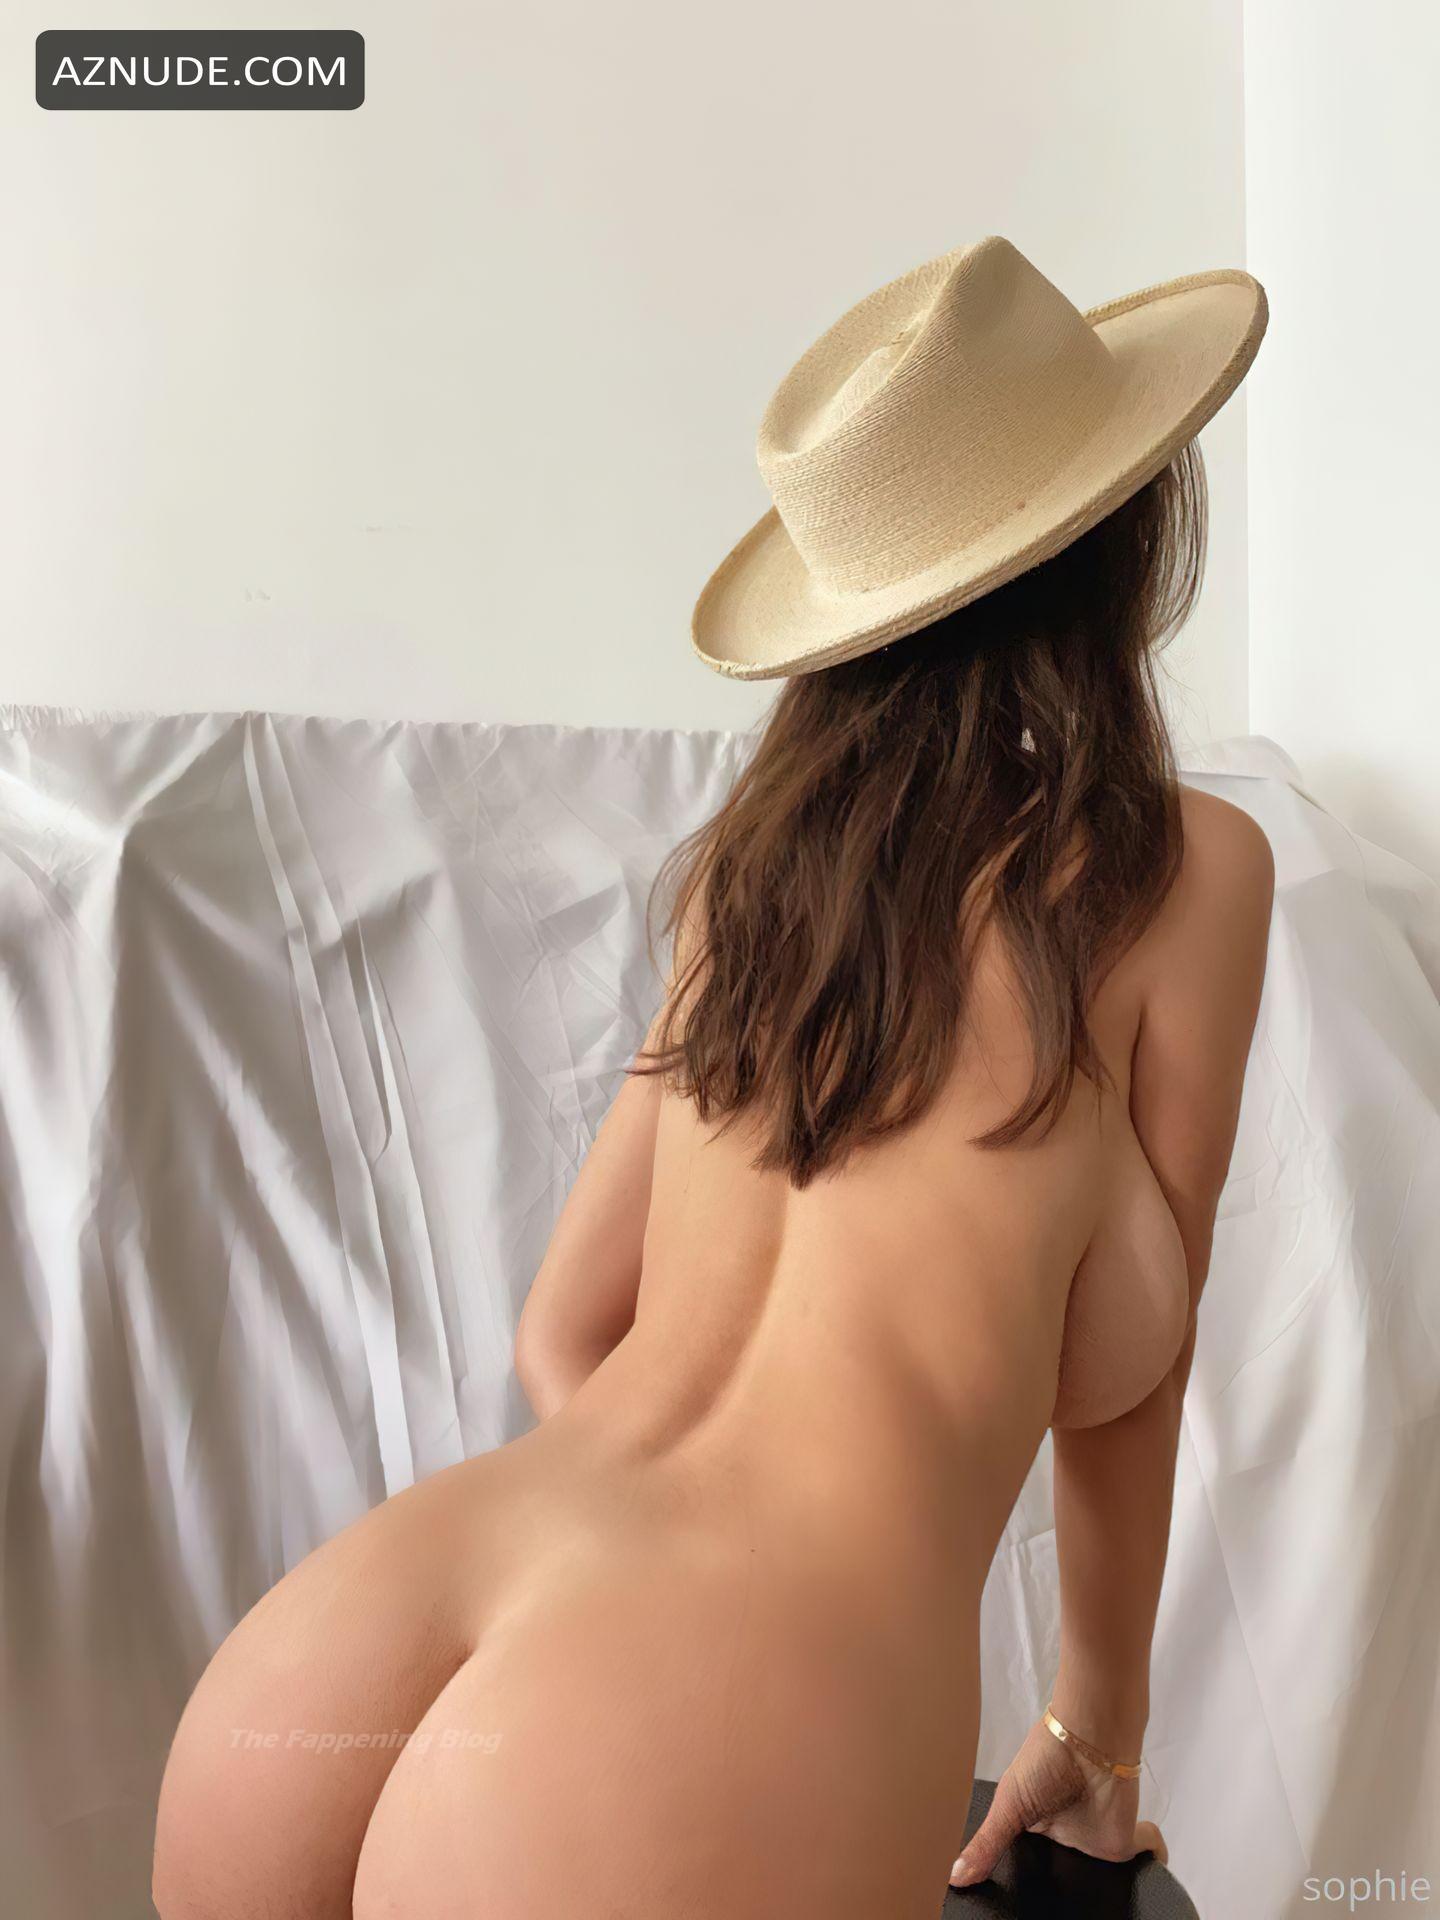 Bikini Sophie Mudd Nude Jpg